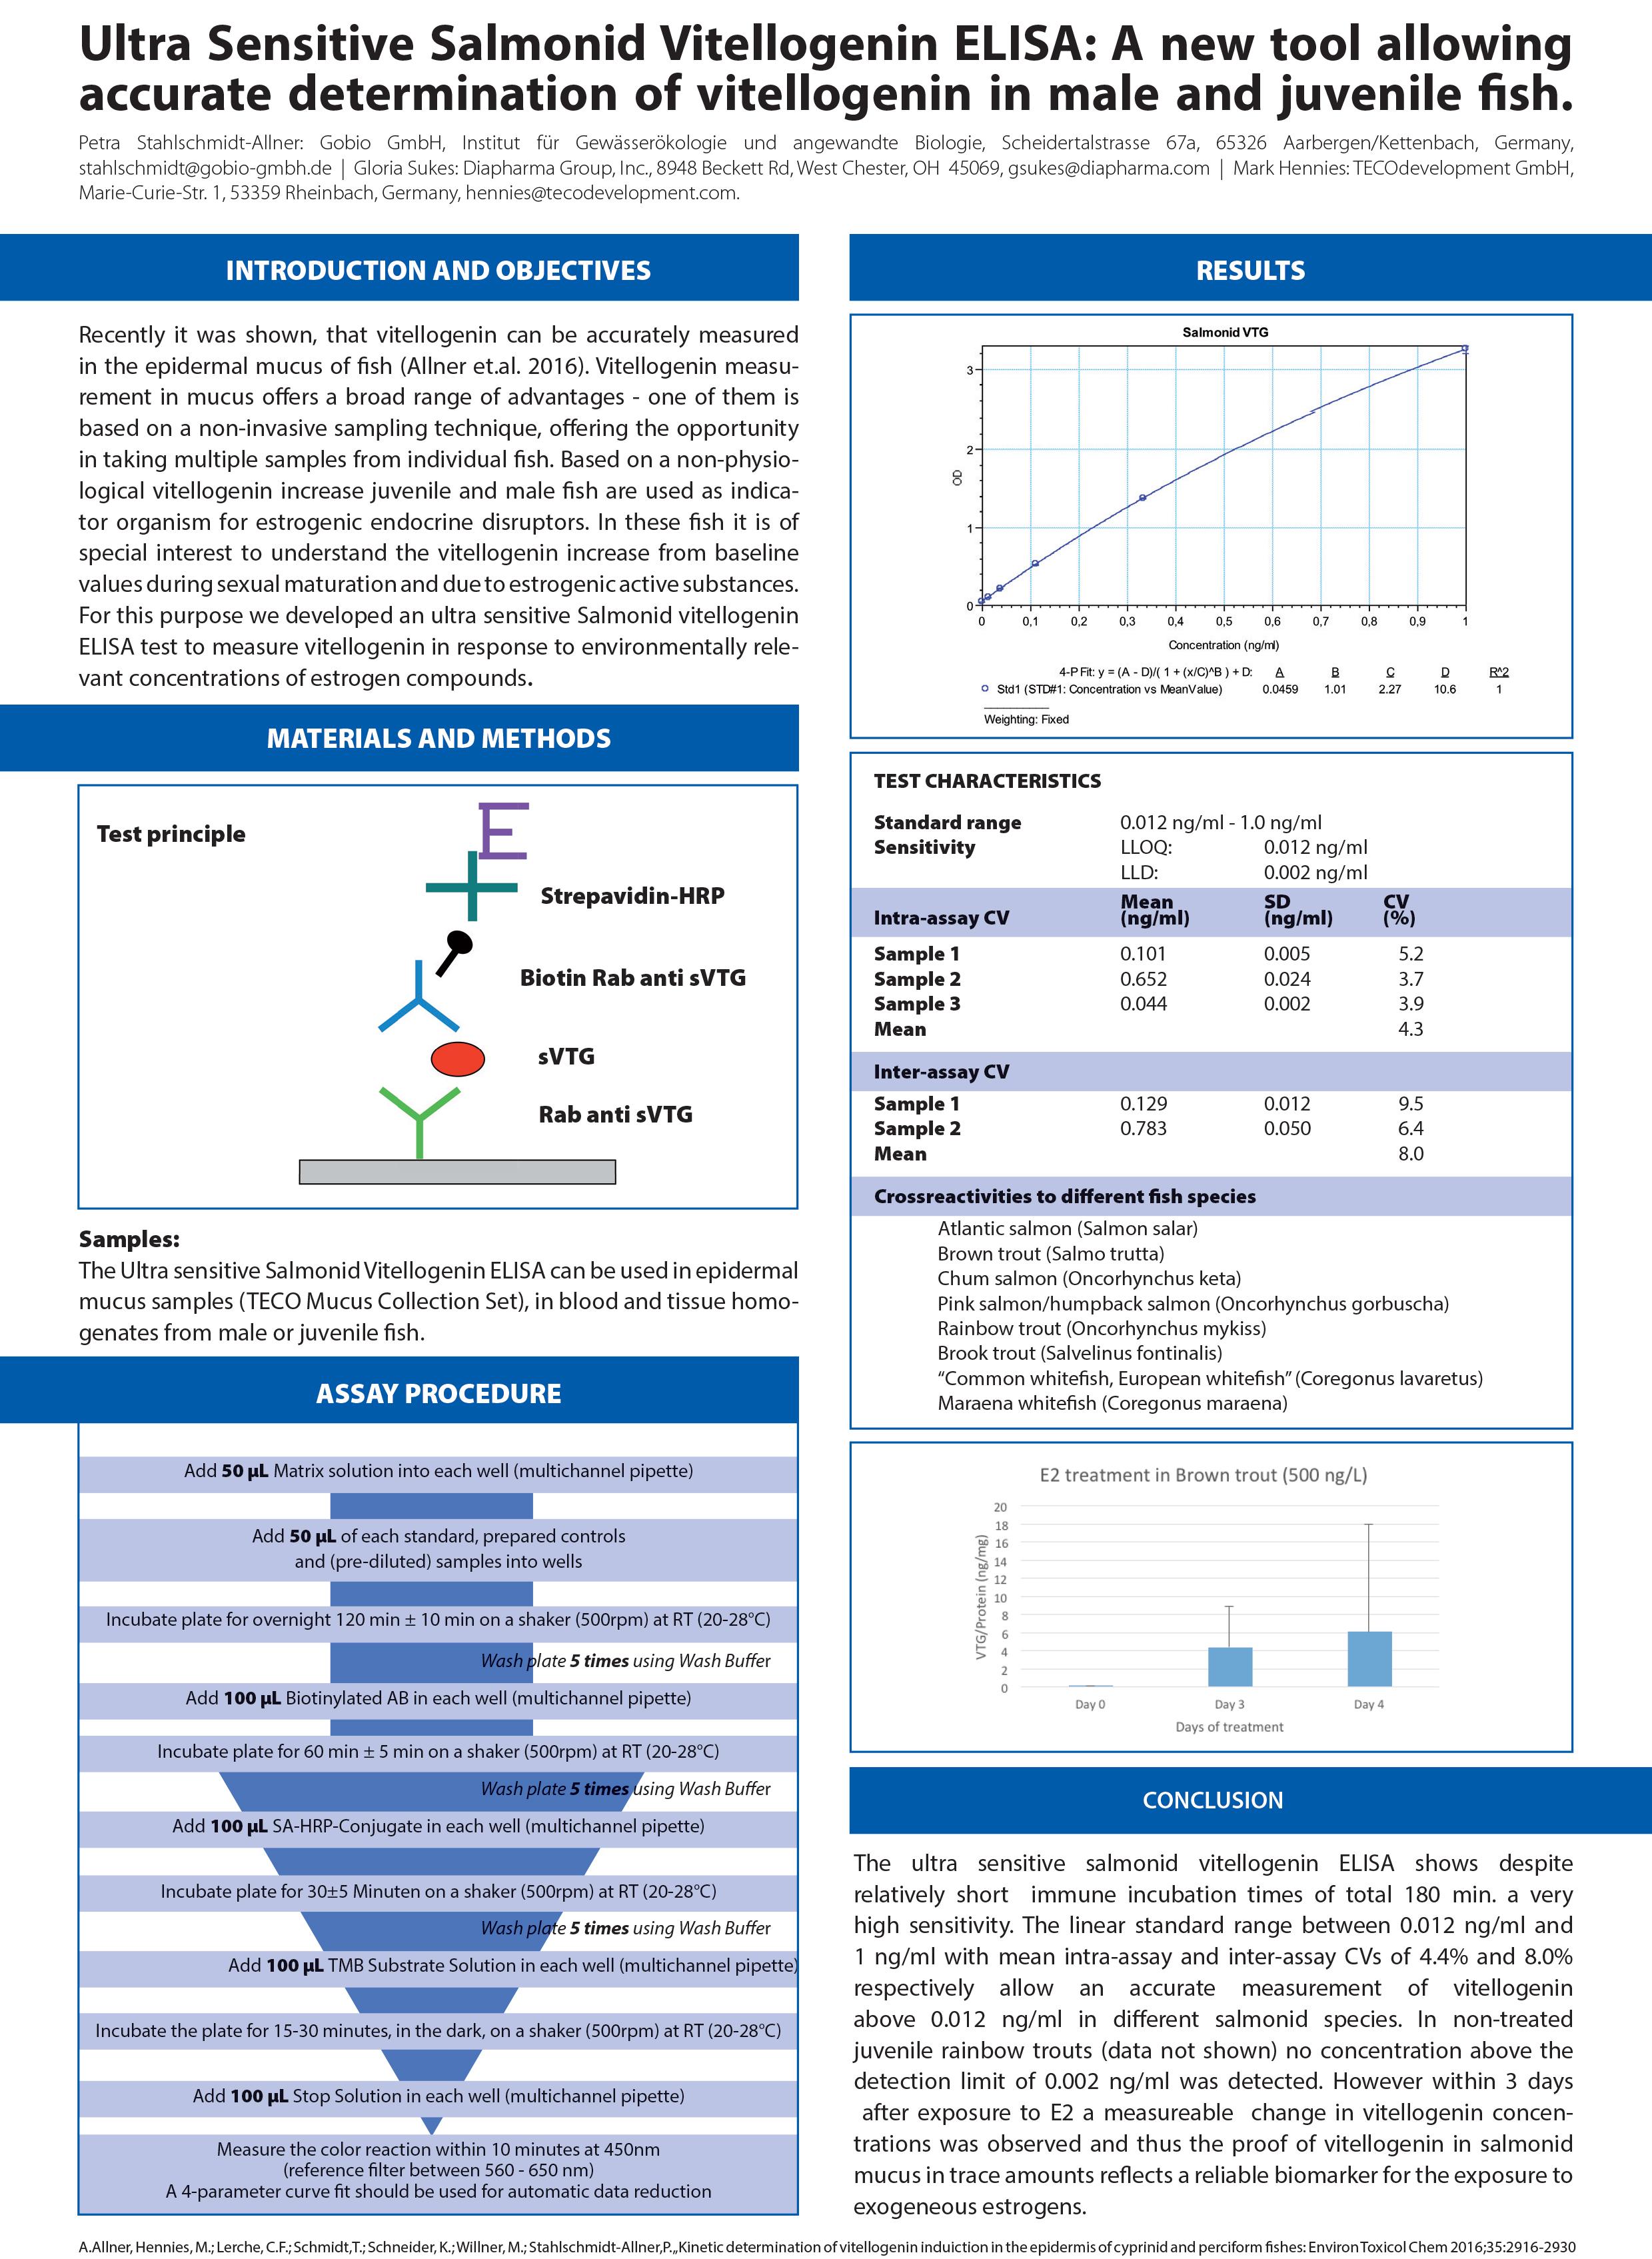 Poster: New Ultra-Sensitive Salmonid Vitellogenin Assay